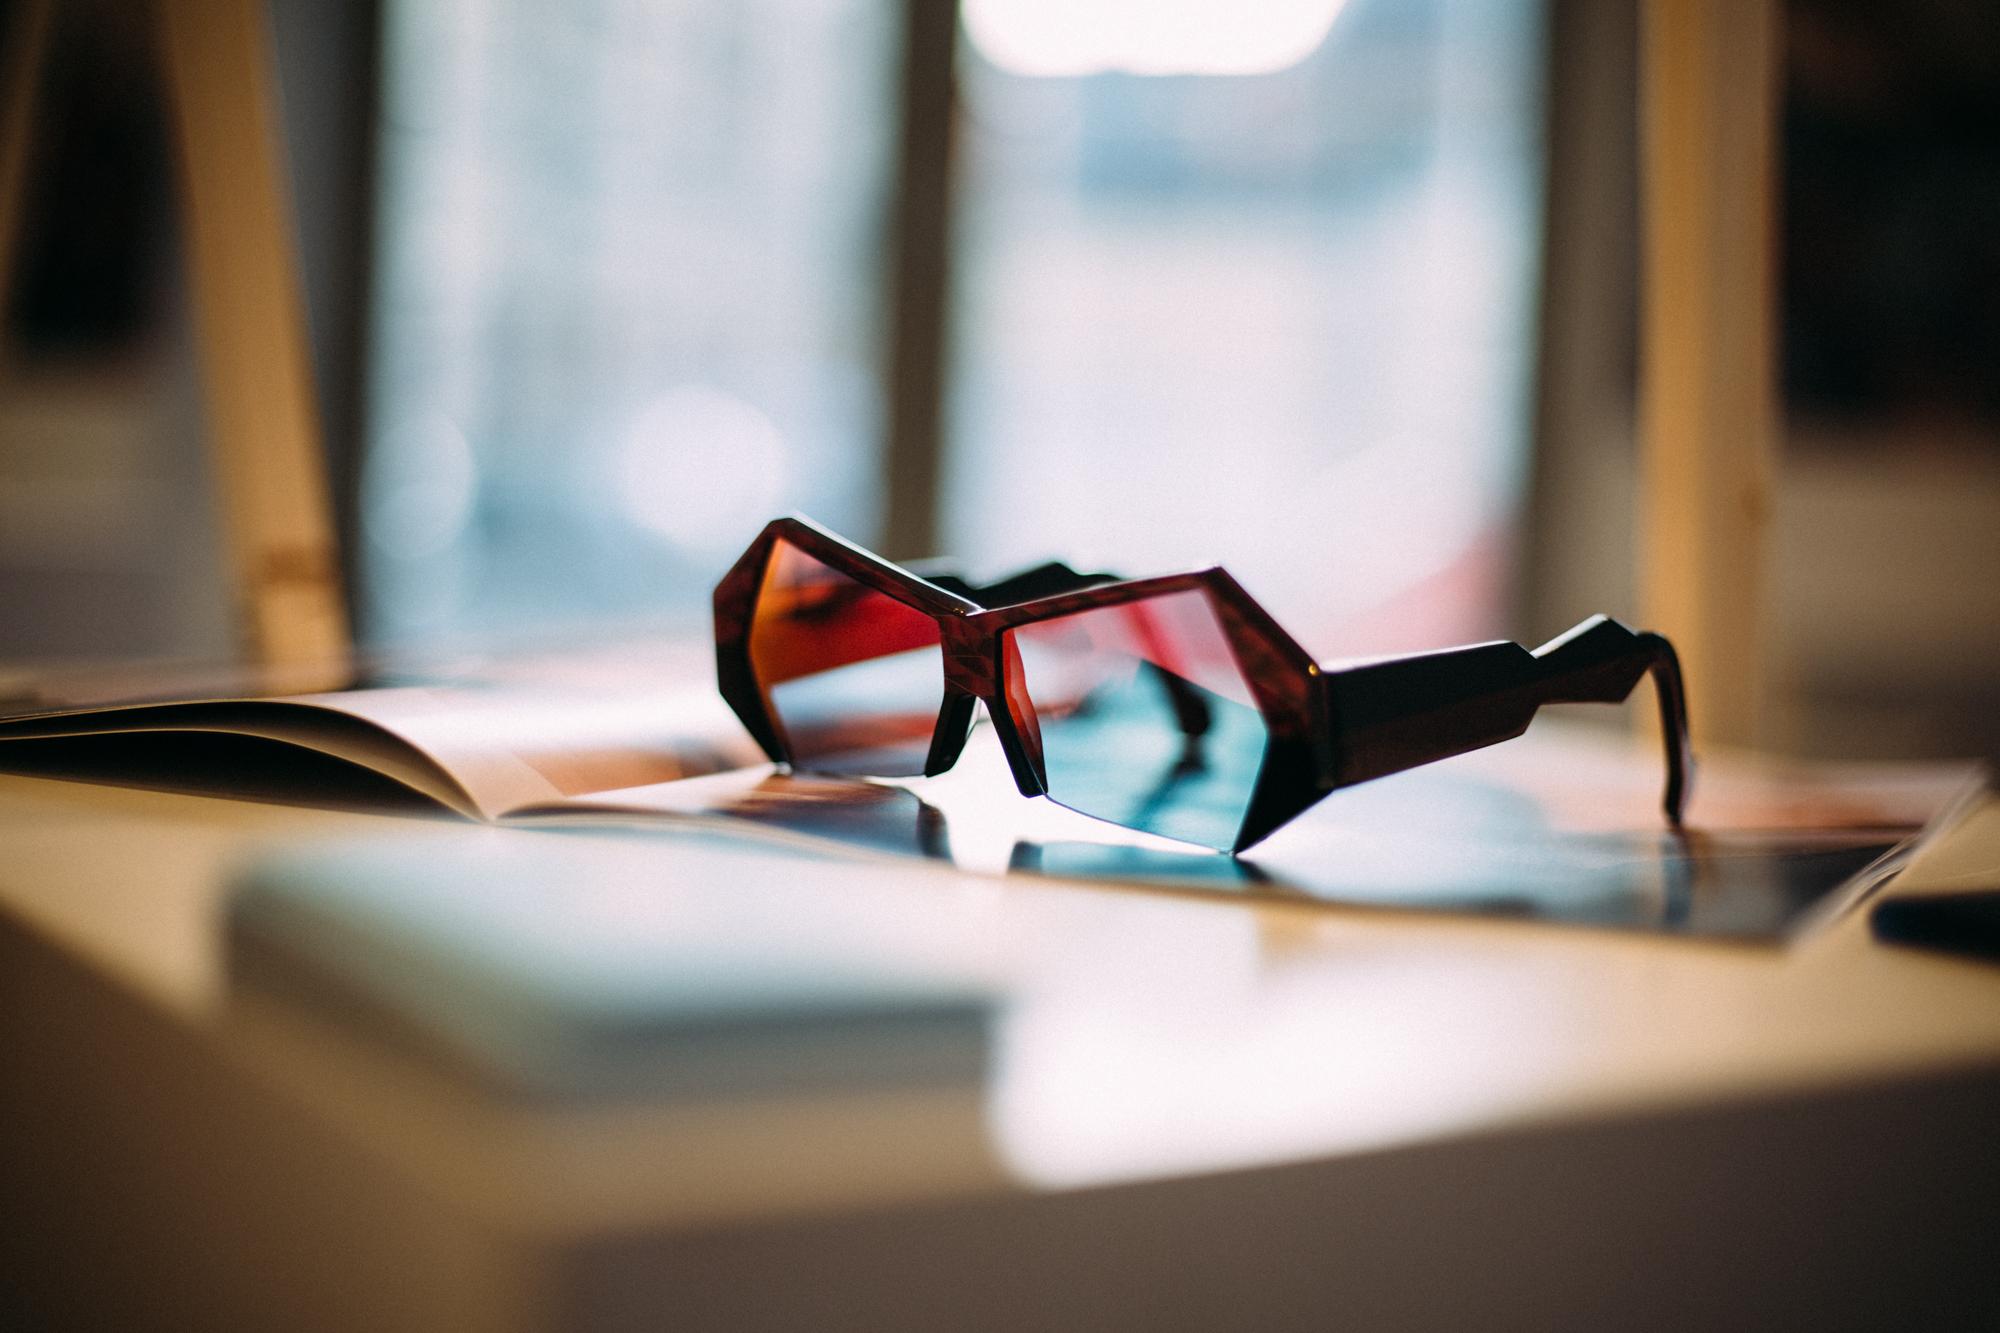 Sterkxs lunettes